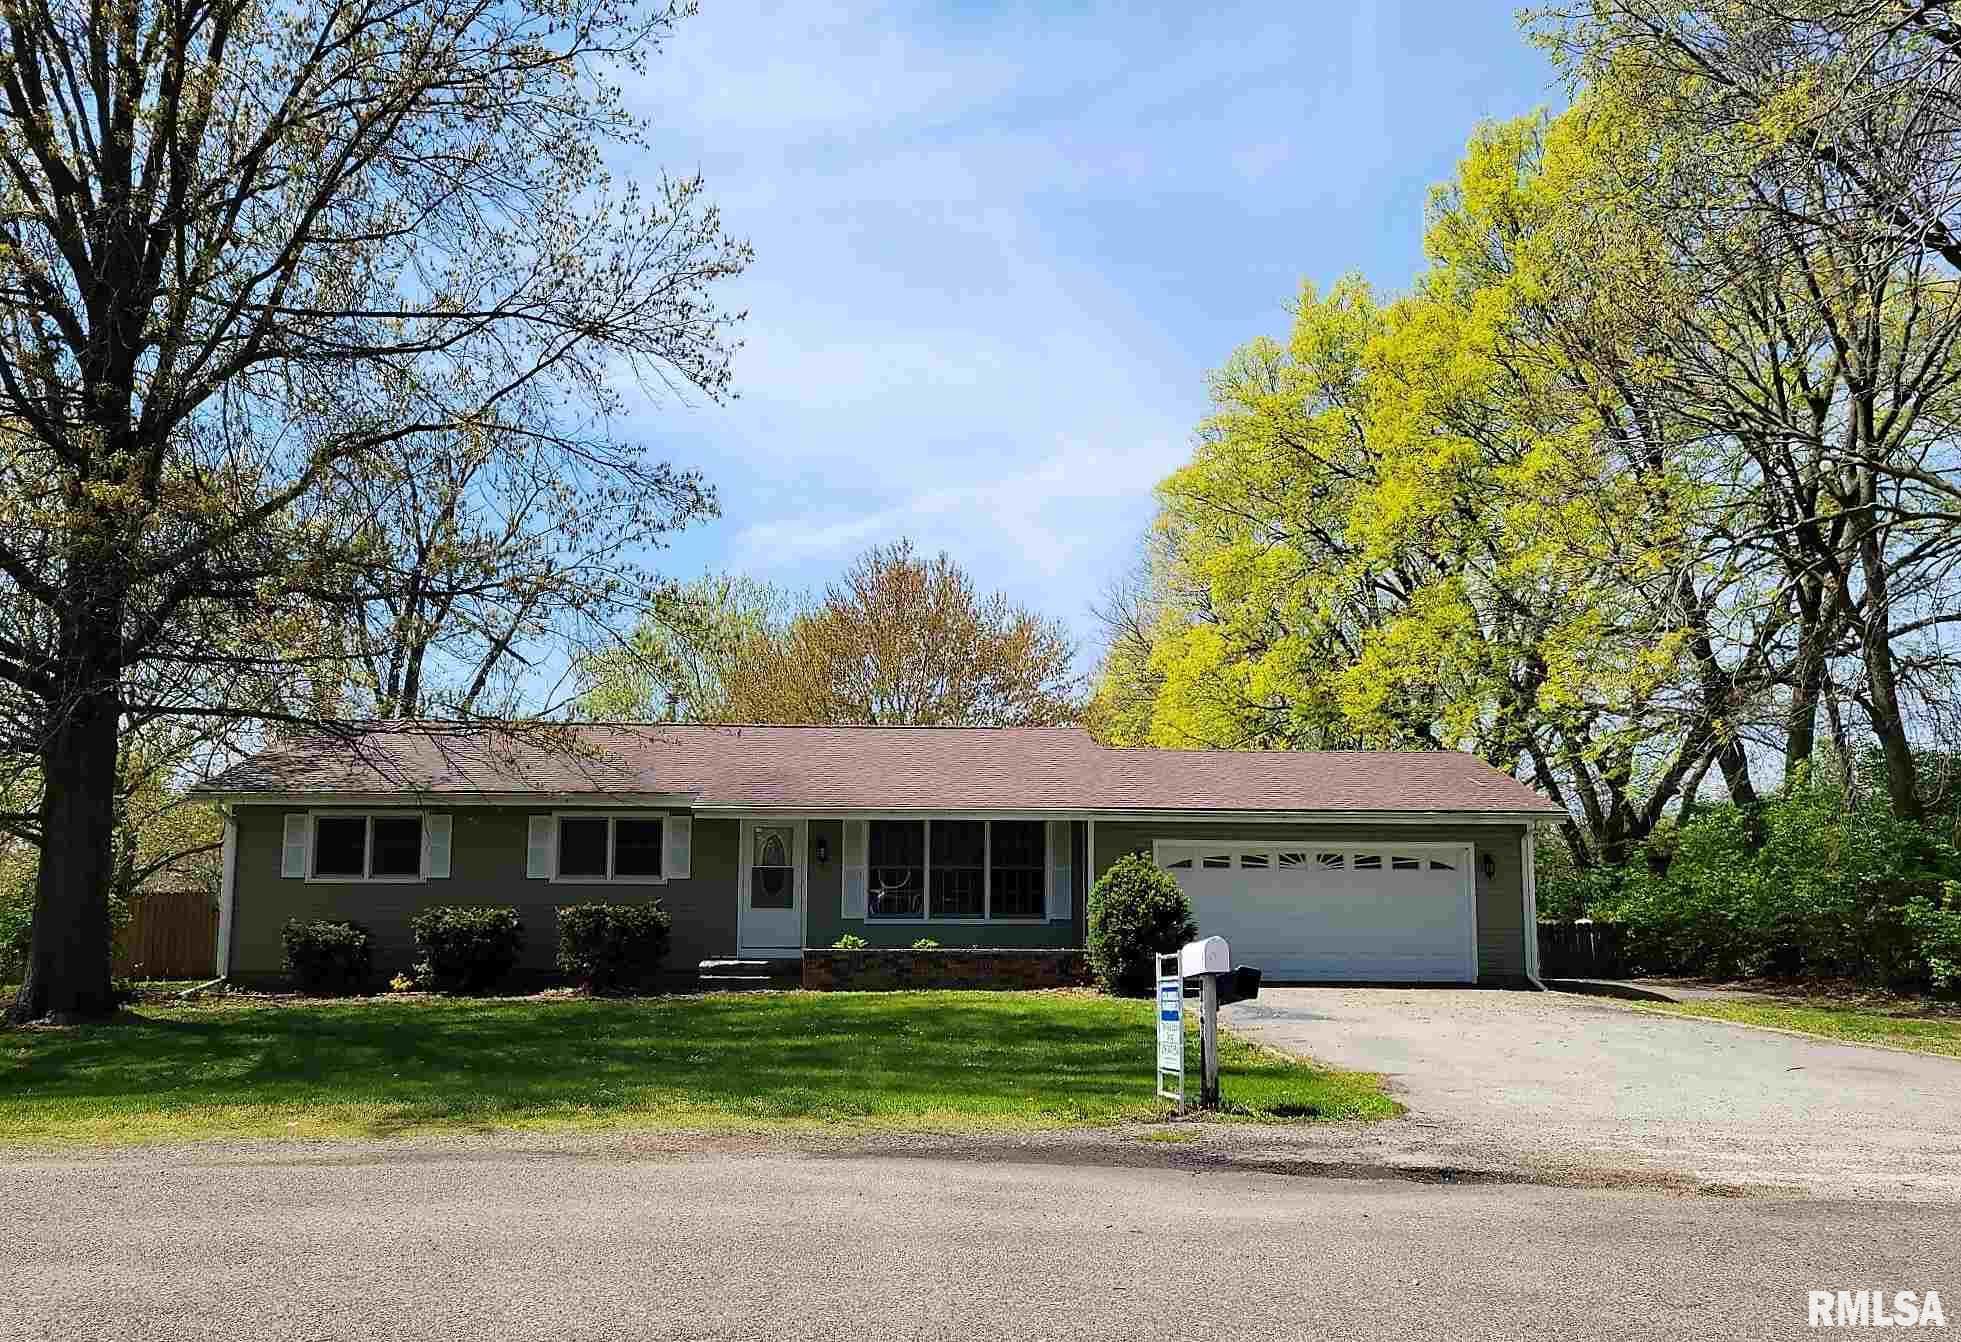 13649 LAUREL Property Photo - Manito, IL real estate listing